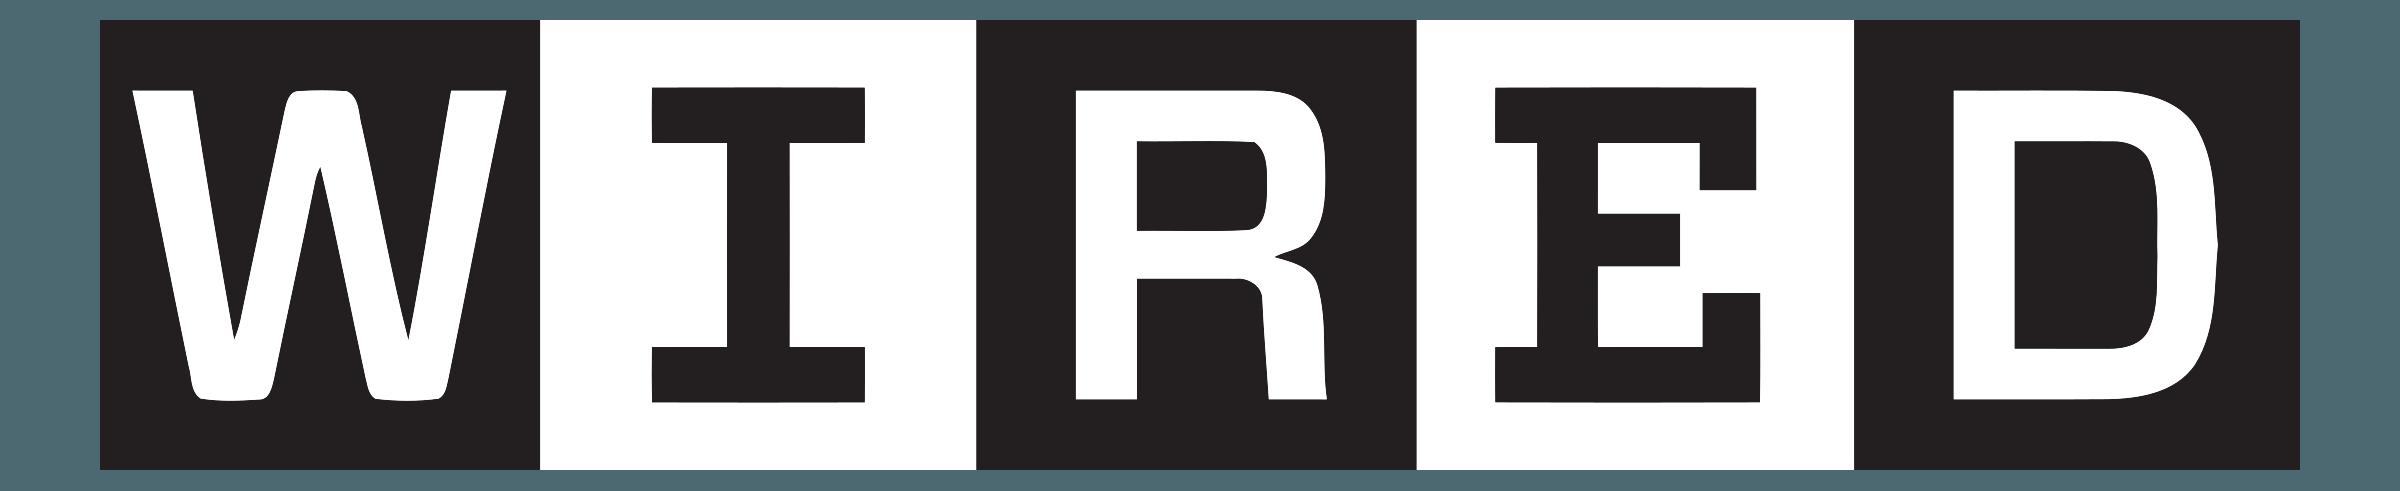 Wired Logo PNG Transparent & SVG Vector.